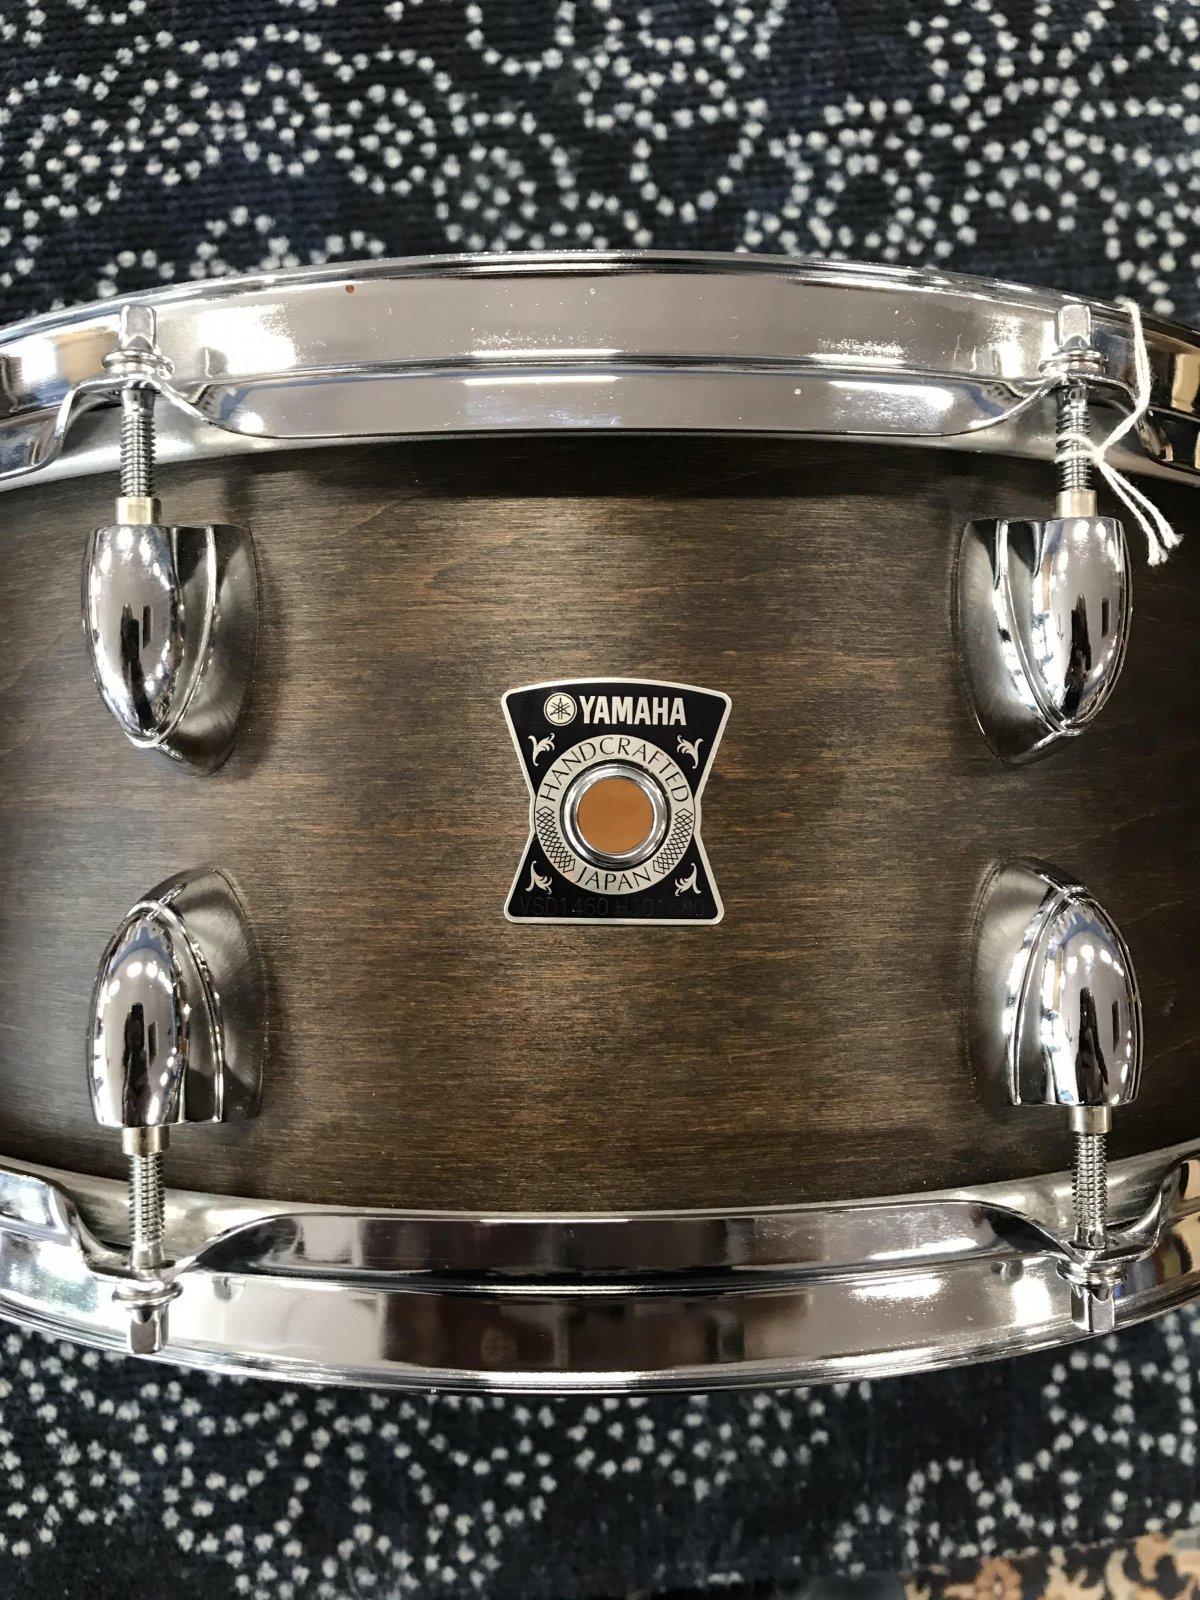 Yamaha Vintage Series Snare Drum 14x6 Vintage Black